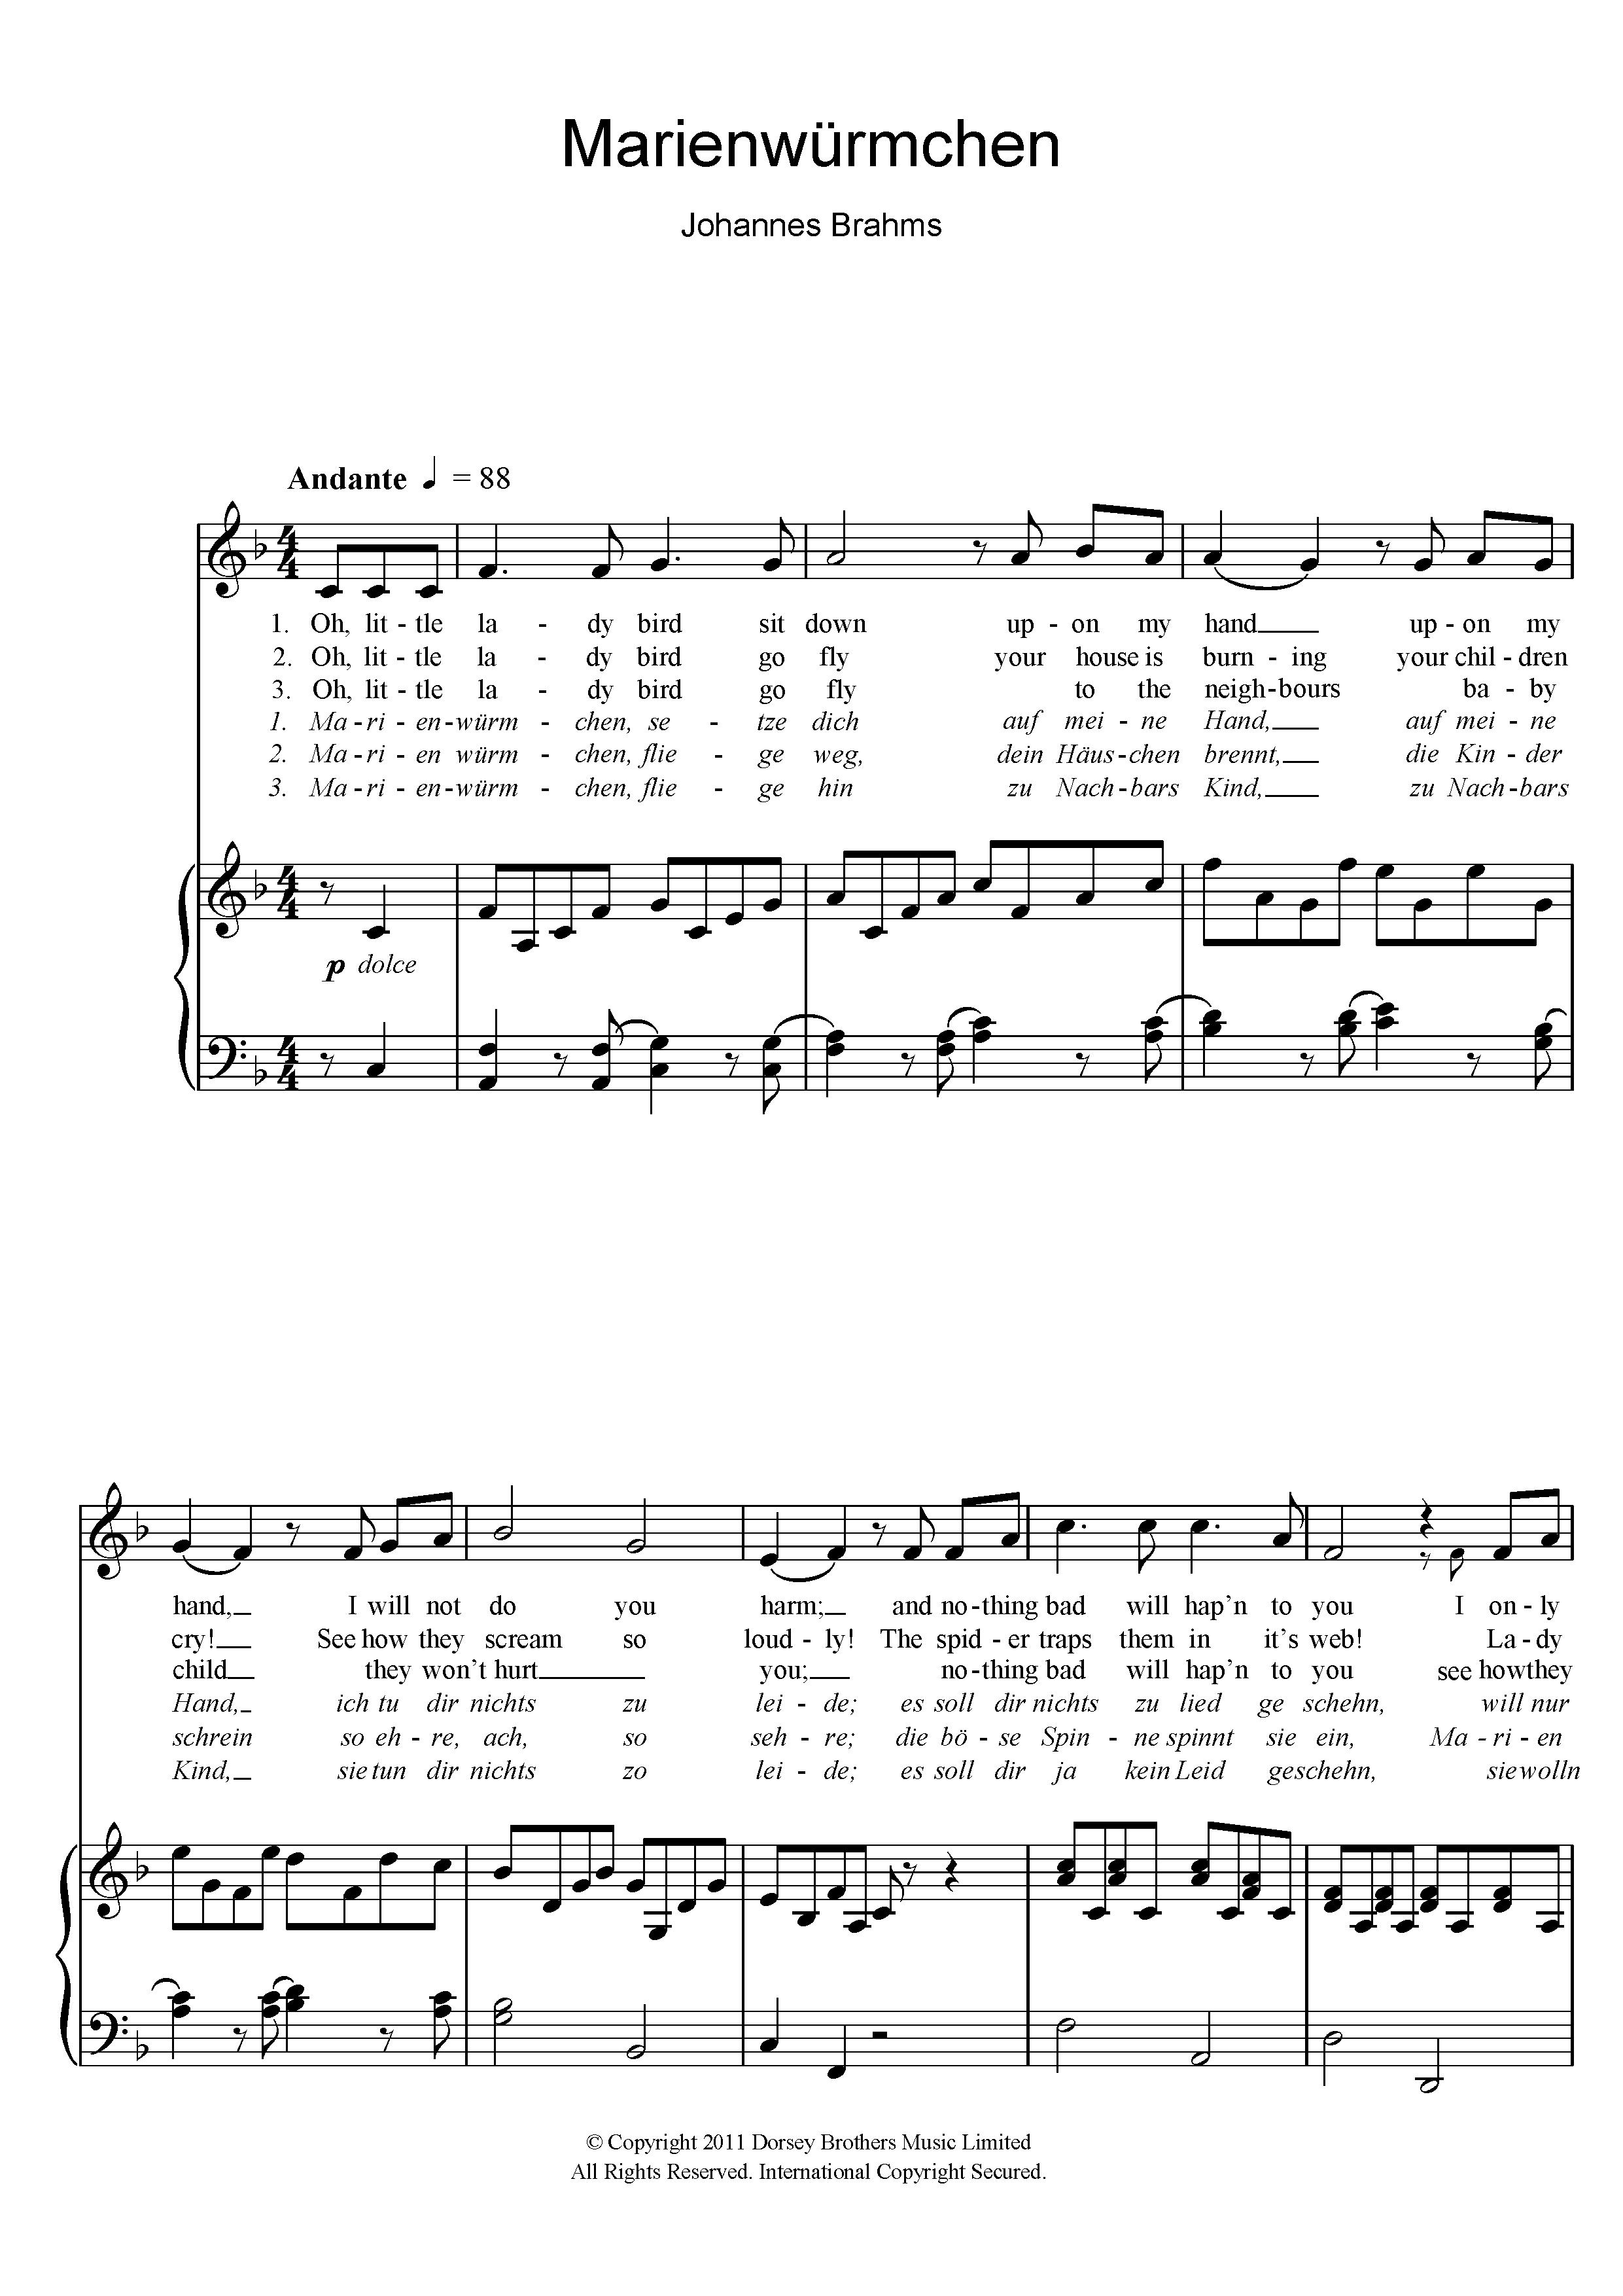 Edvard Grieg - Marienwurmchen